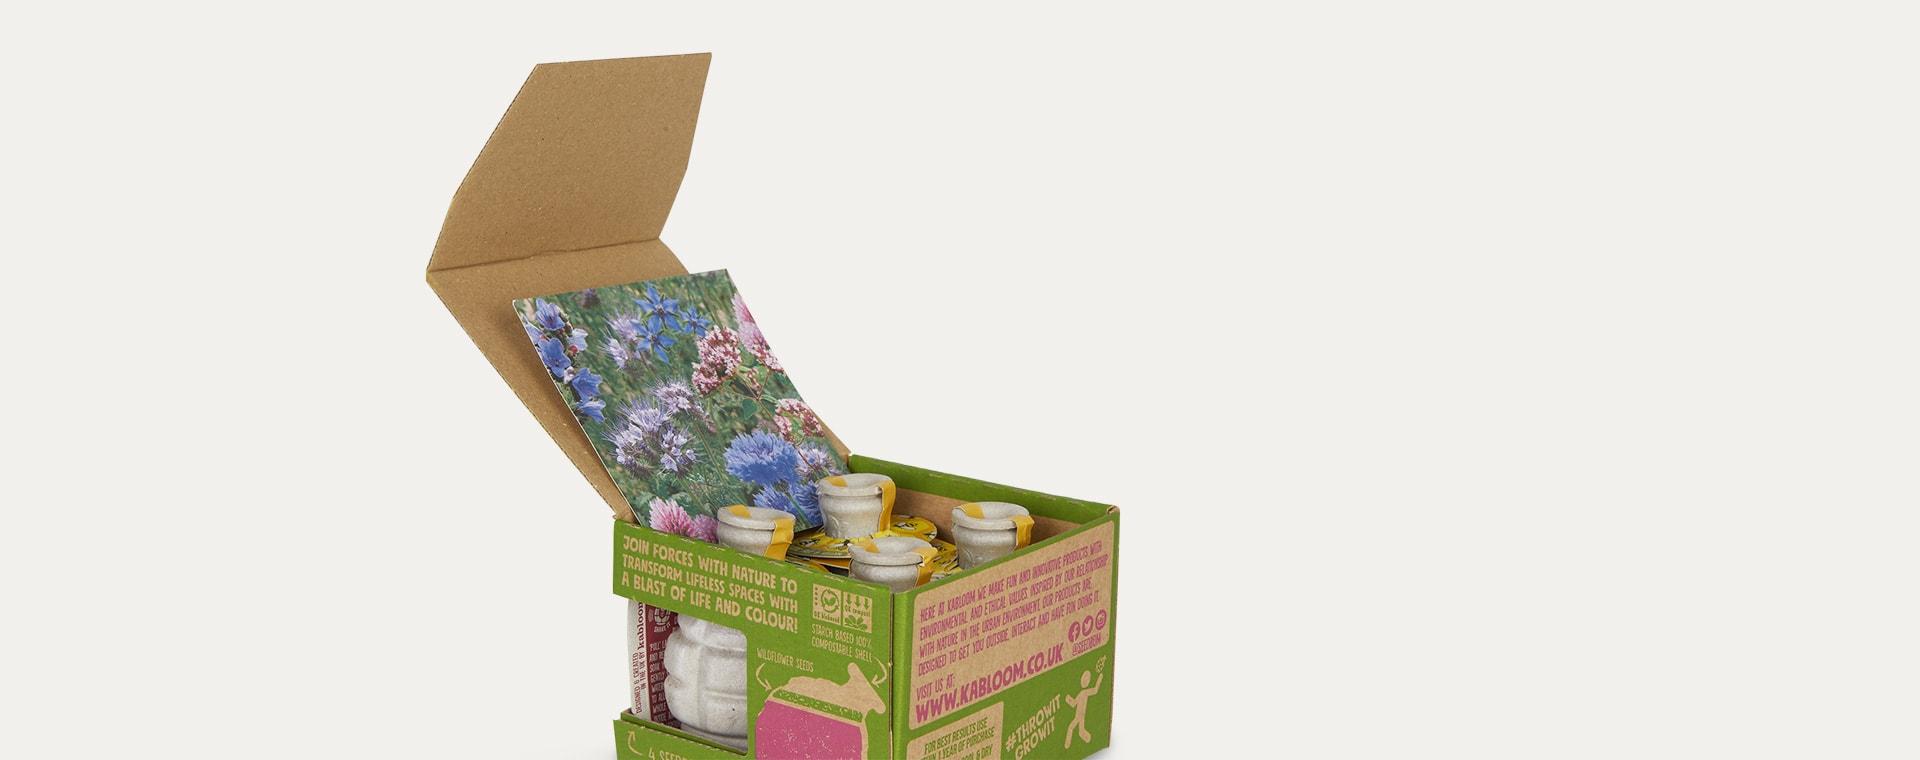 Pollinator Power Seedbom Seedbom Gift Box